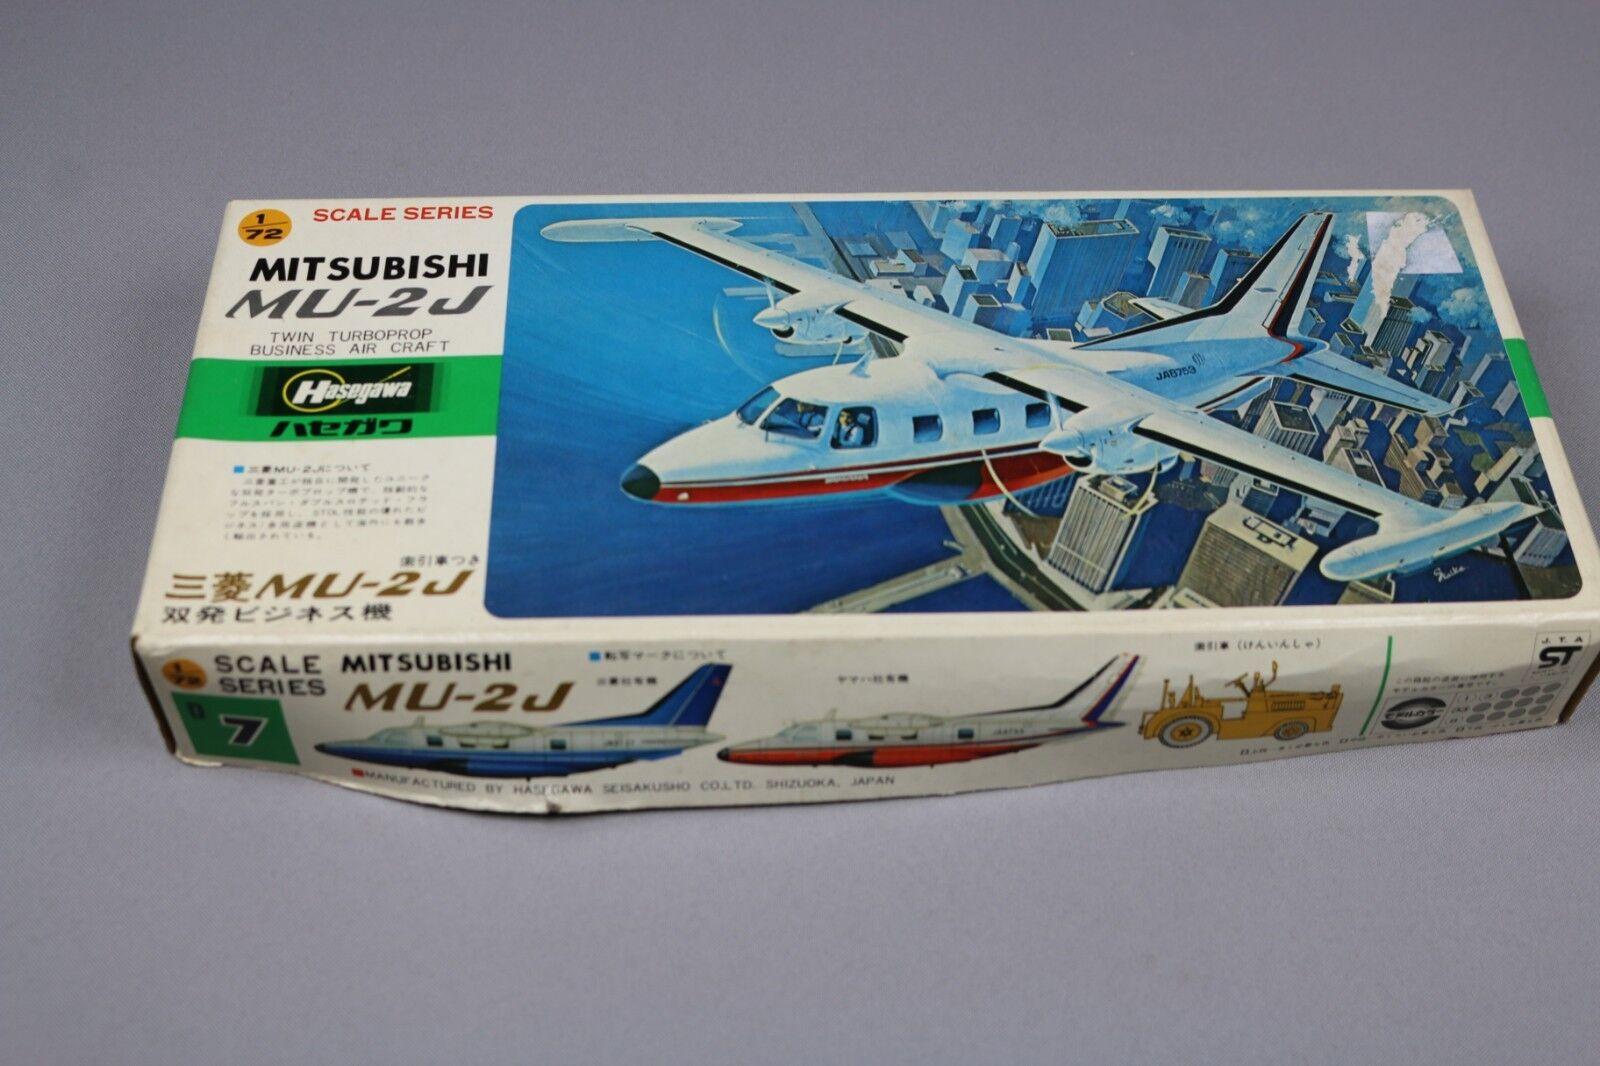 ZF147 Hasegawa 1 72 maquette avion D7 D007 500 mitsubishi MU-2J twin turboprop